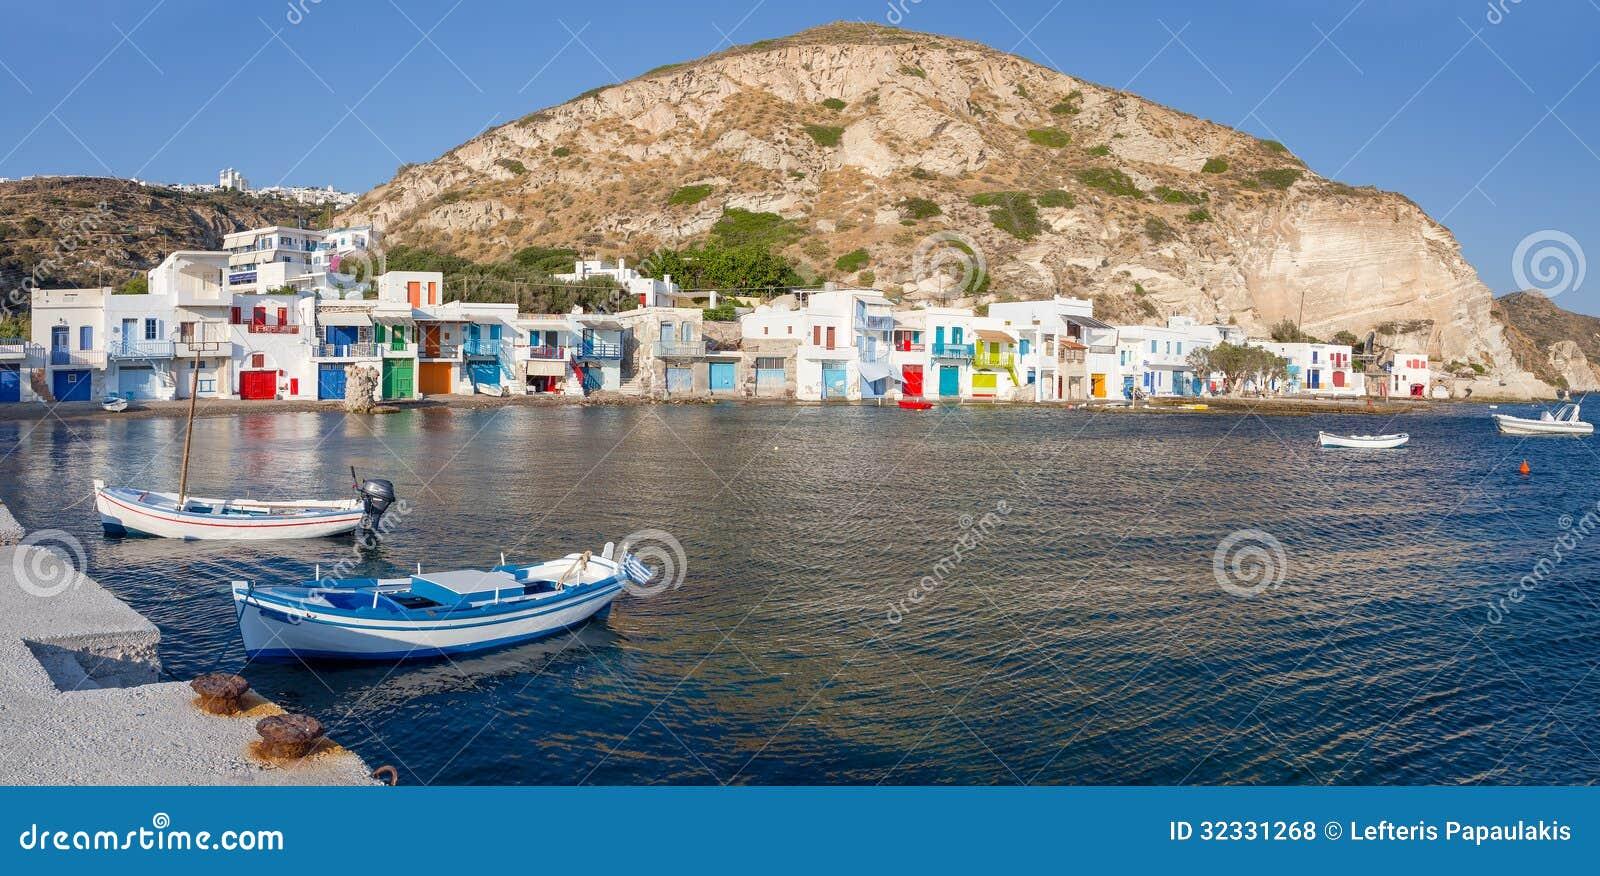 Klima Fishing Village Milos Island Cyclades Greece